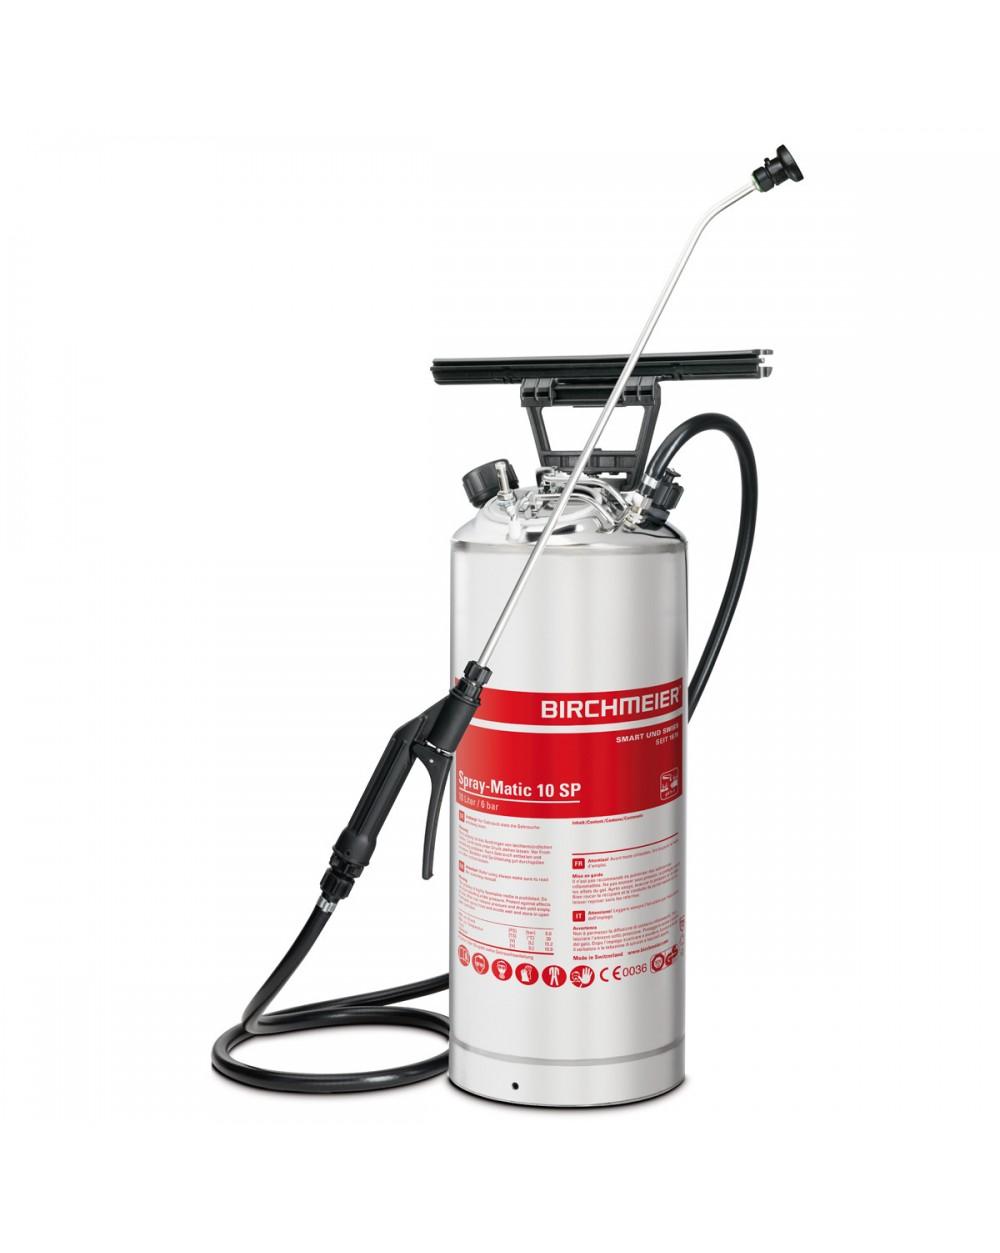 SPRAY MATIC 10 SP PULVERISATEUR POMPE A MAIN & RACCORD A AIR COMPRIME